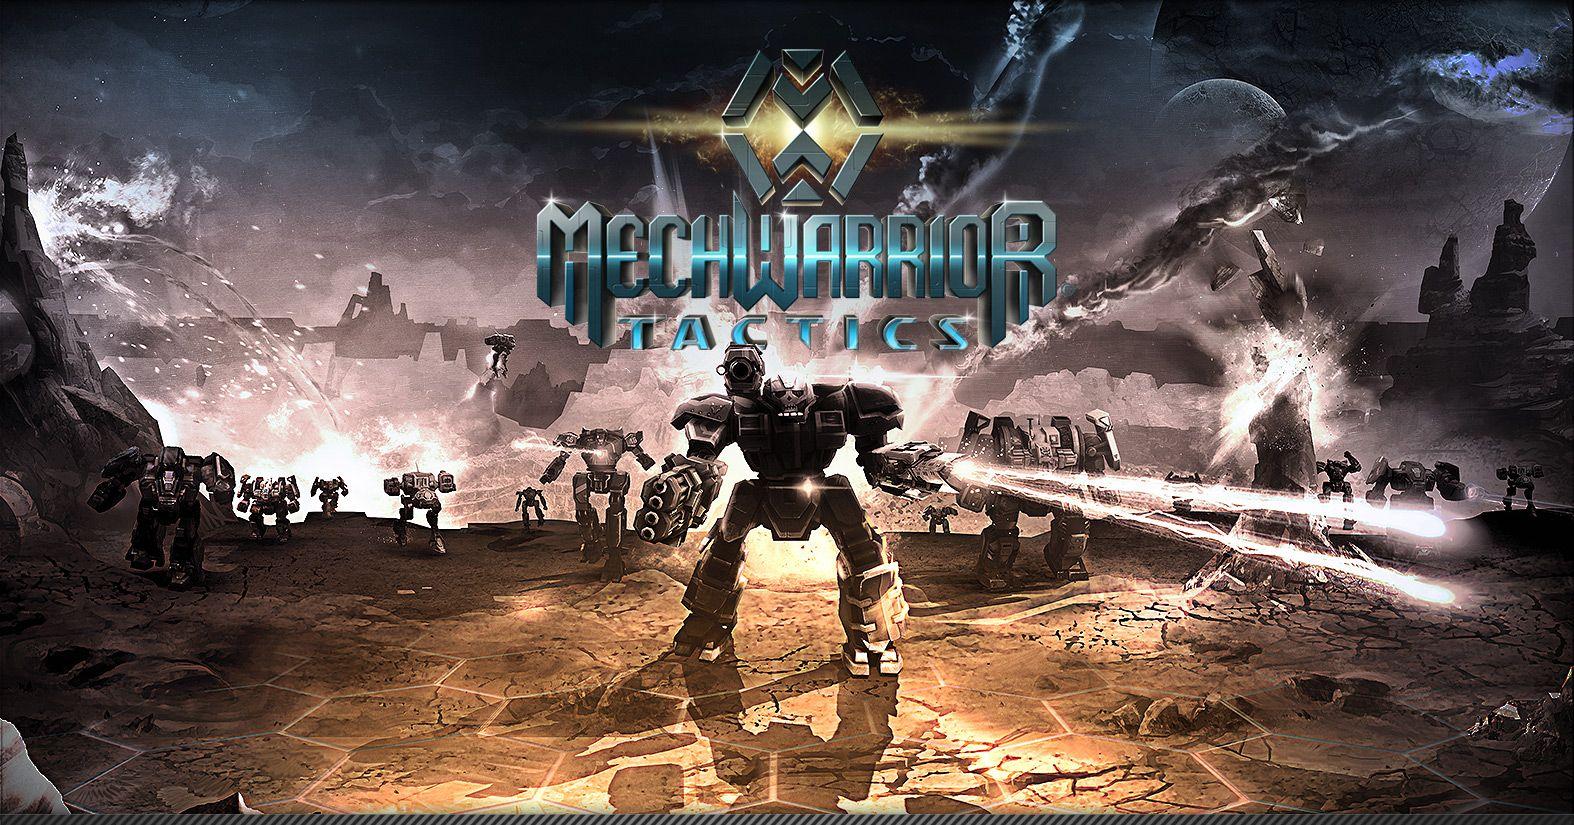 MechWarrior Tactics hintergrundbilder 1574x825